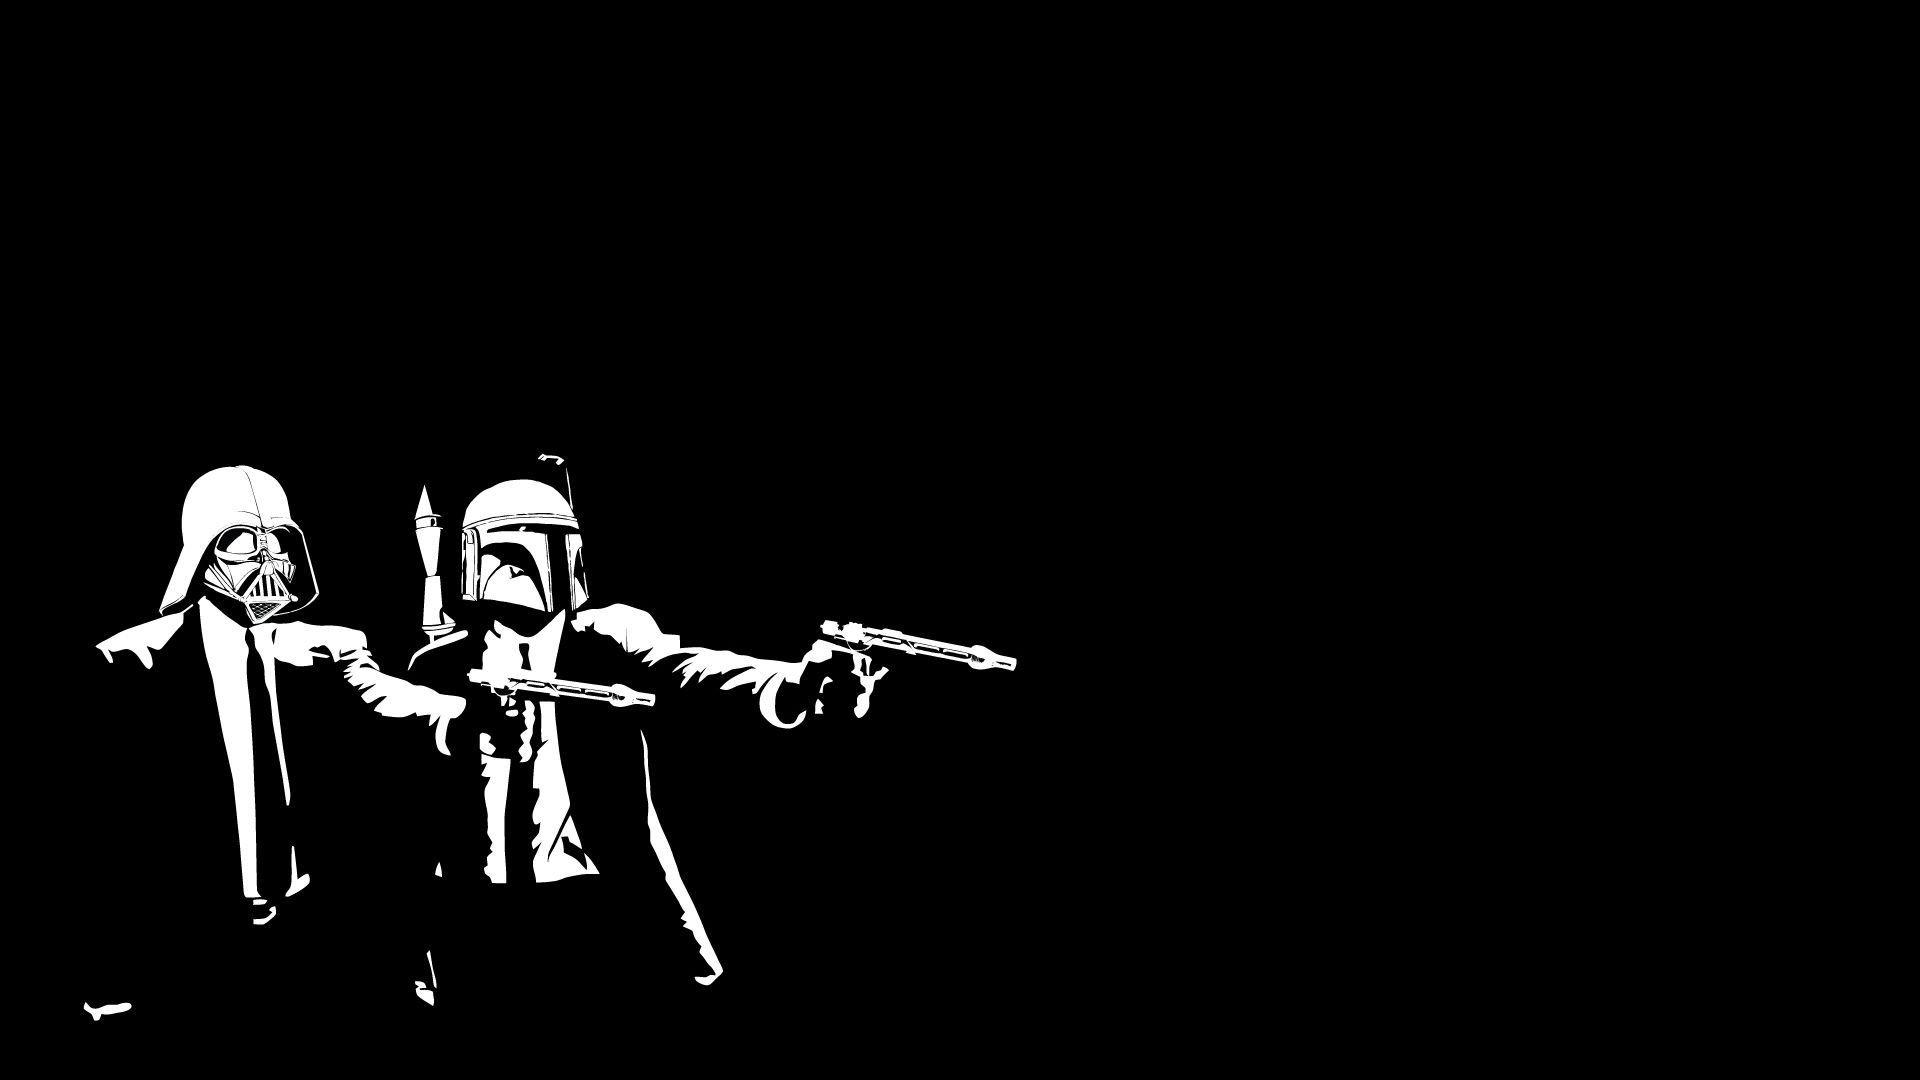 Star Wars Pulp Fiction Wallpaper Wallpapersafari